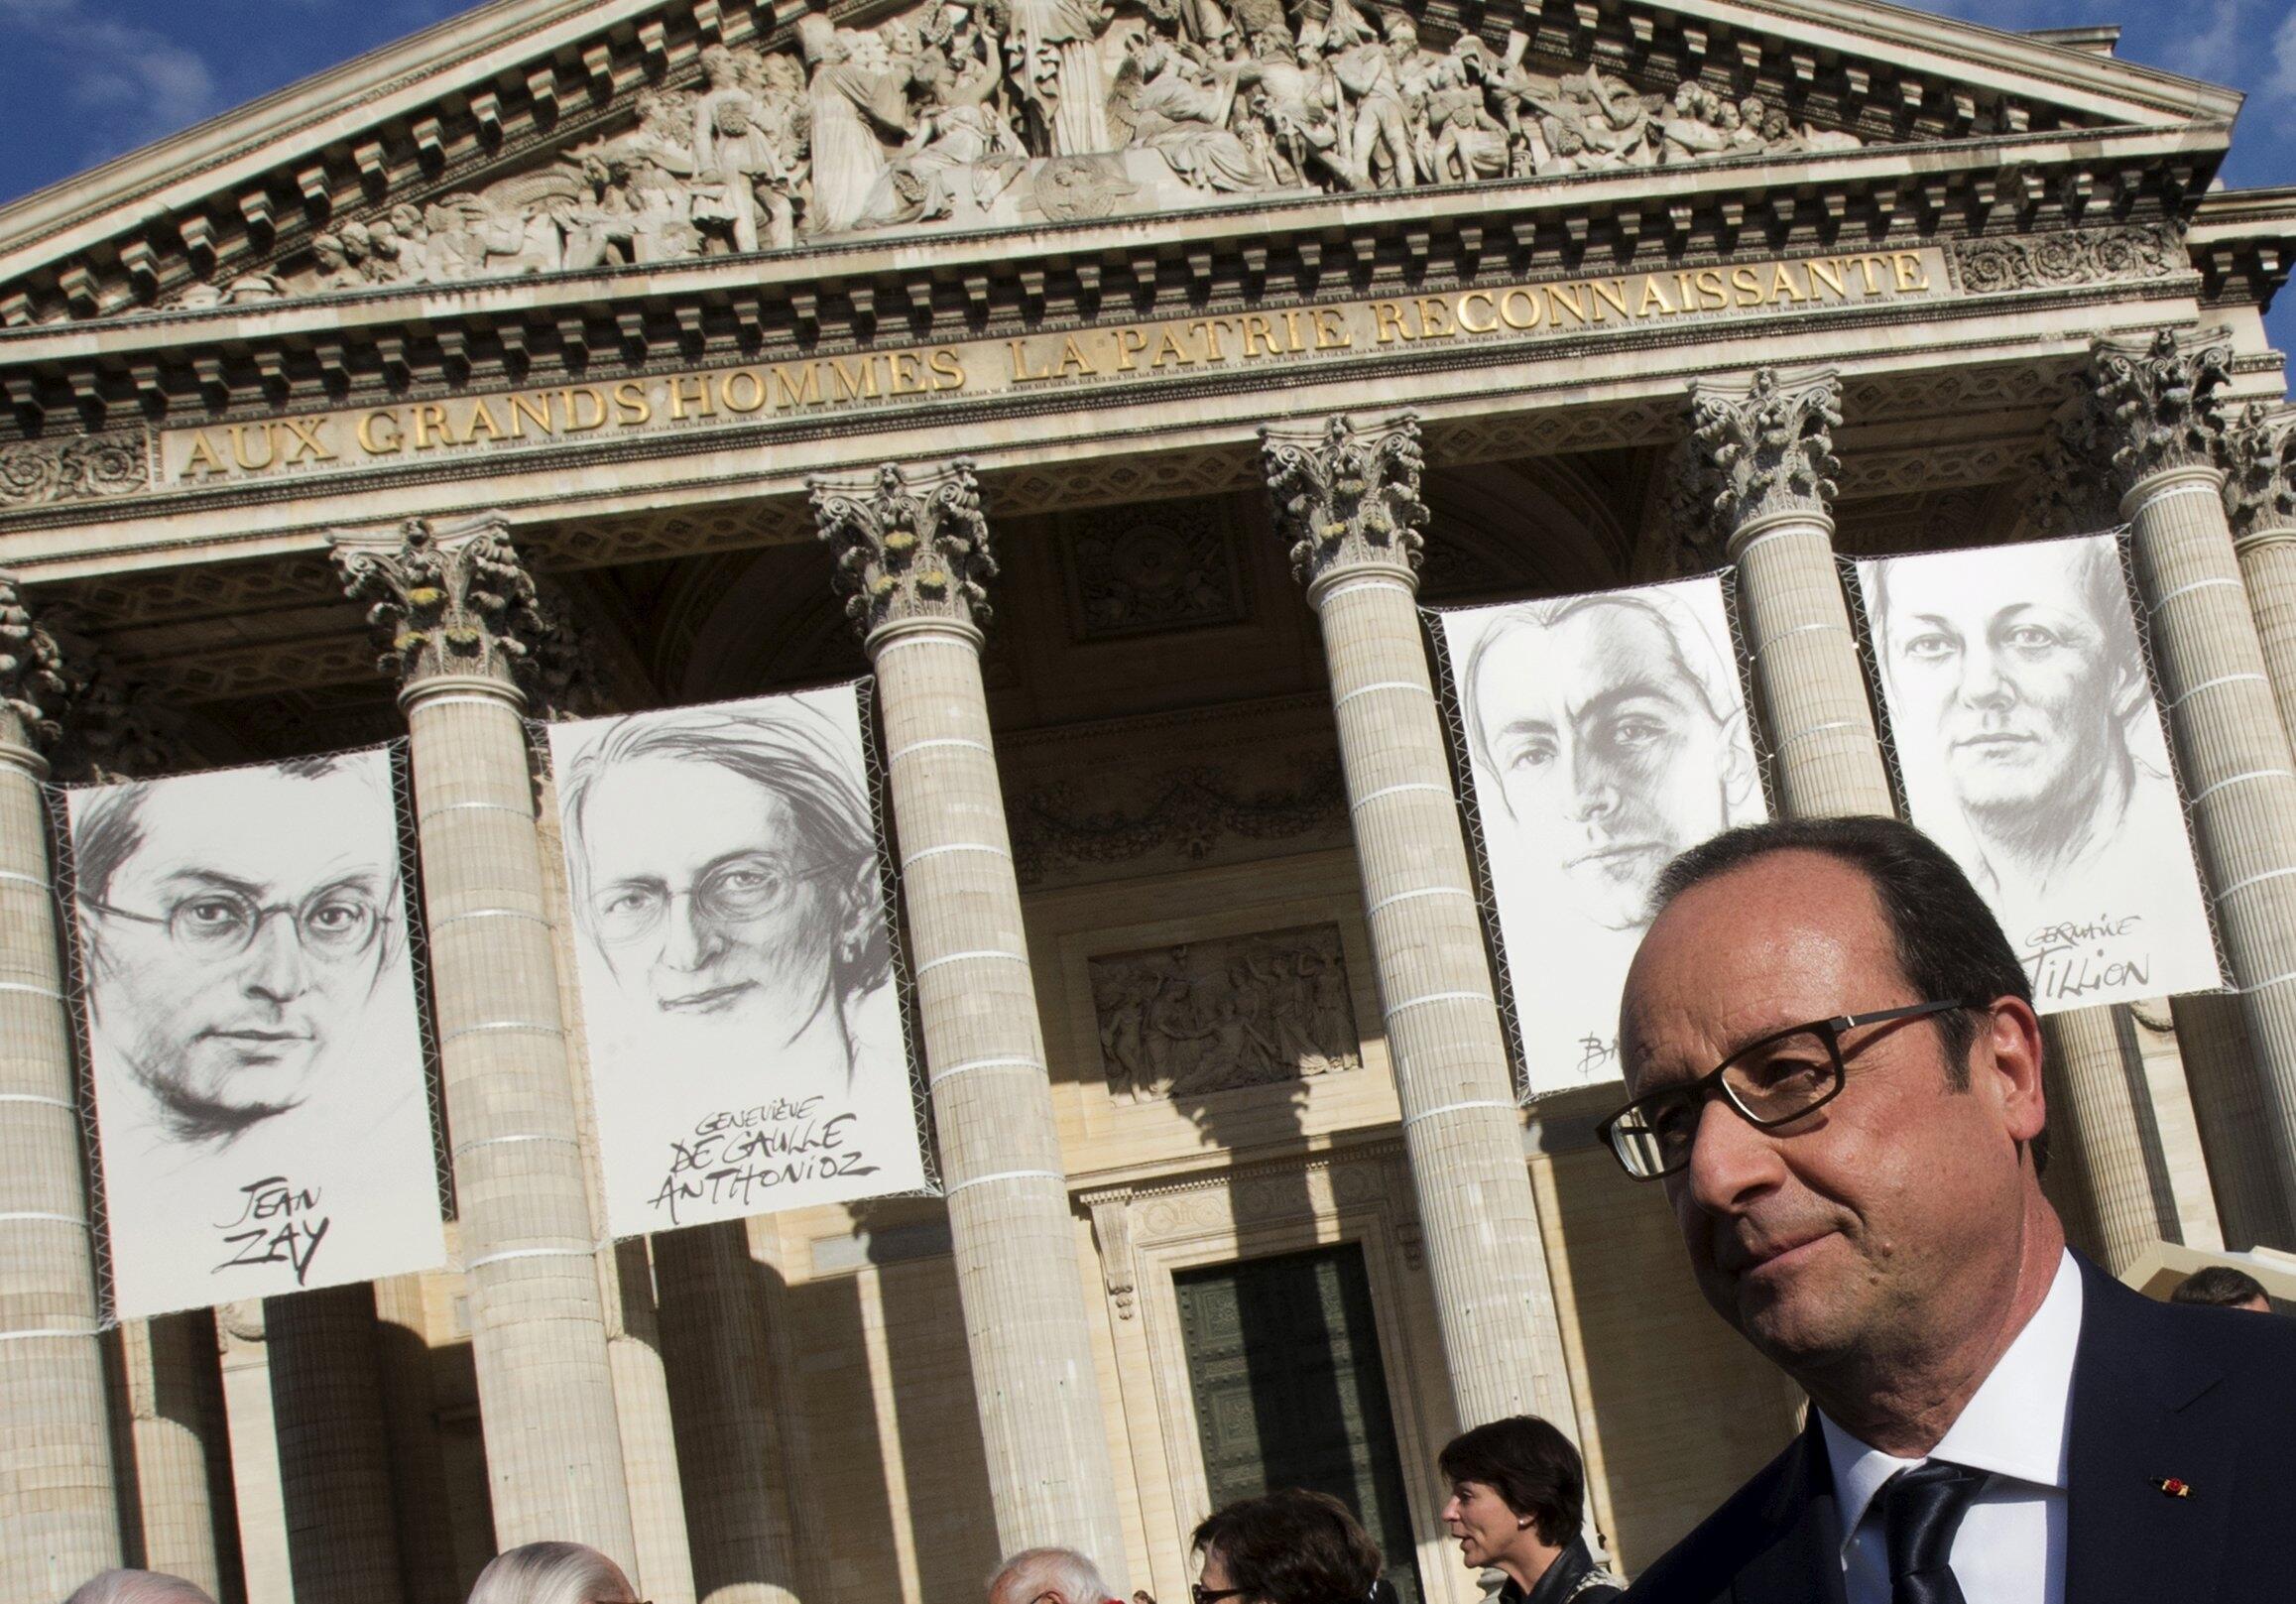 François Hollande in front of portraits of Germaine Tillon, Geneviève de Gaulle Anthonioz, Pierre Brossolette  Jean Zay at the Panthéon, 27 May 2015